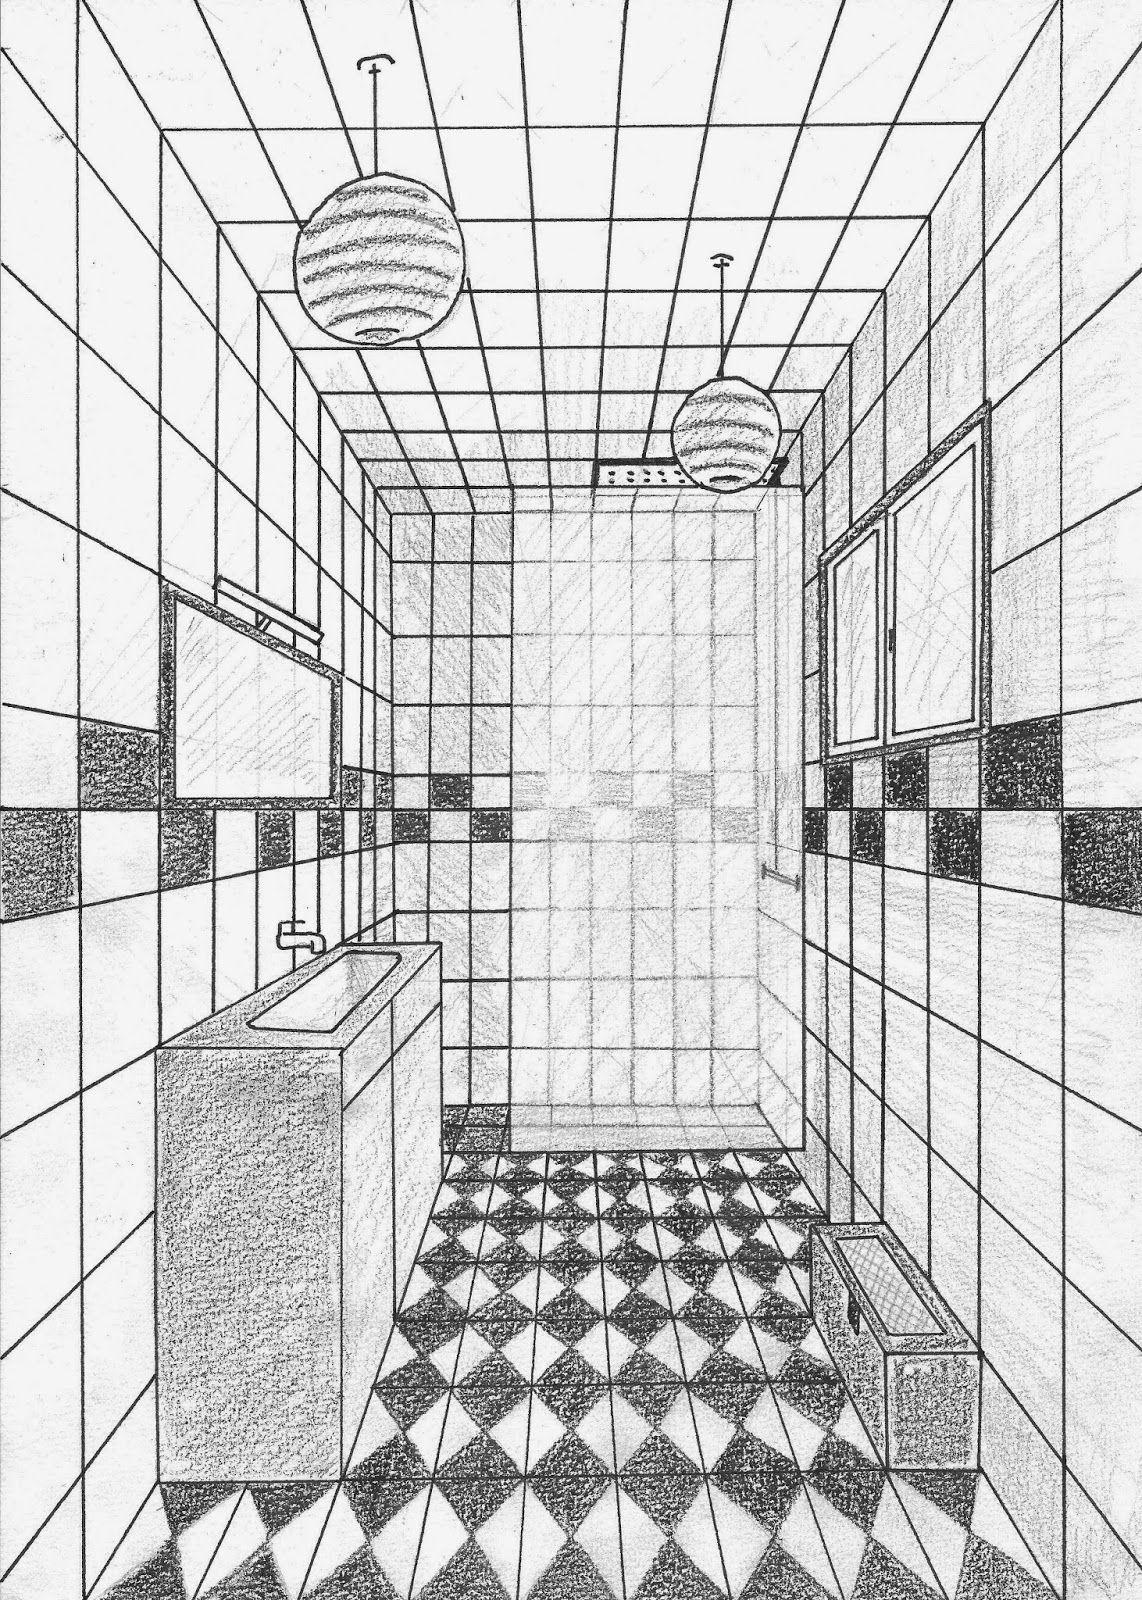 Perspective chez vapi blog brai yba drawings interior sketch et drawing interior - Dessiner un meuble en perspective ...